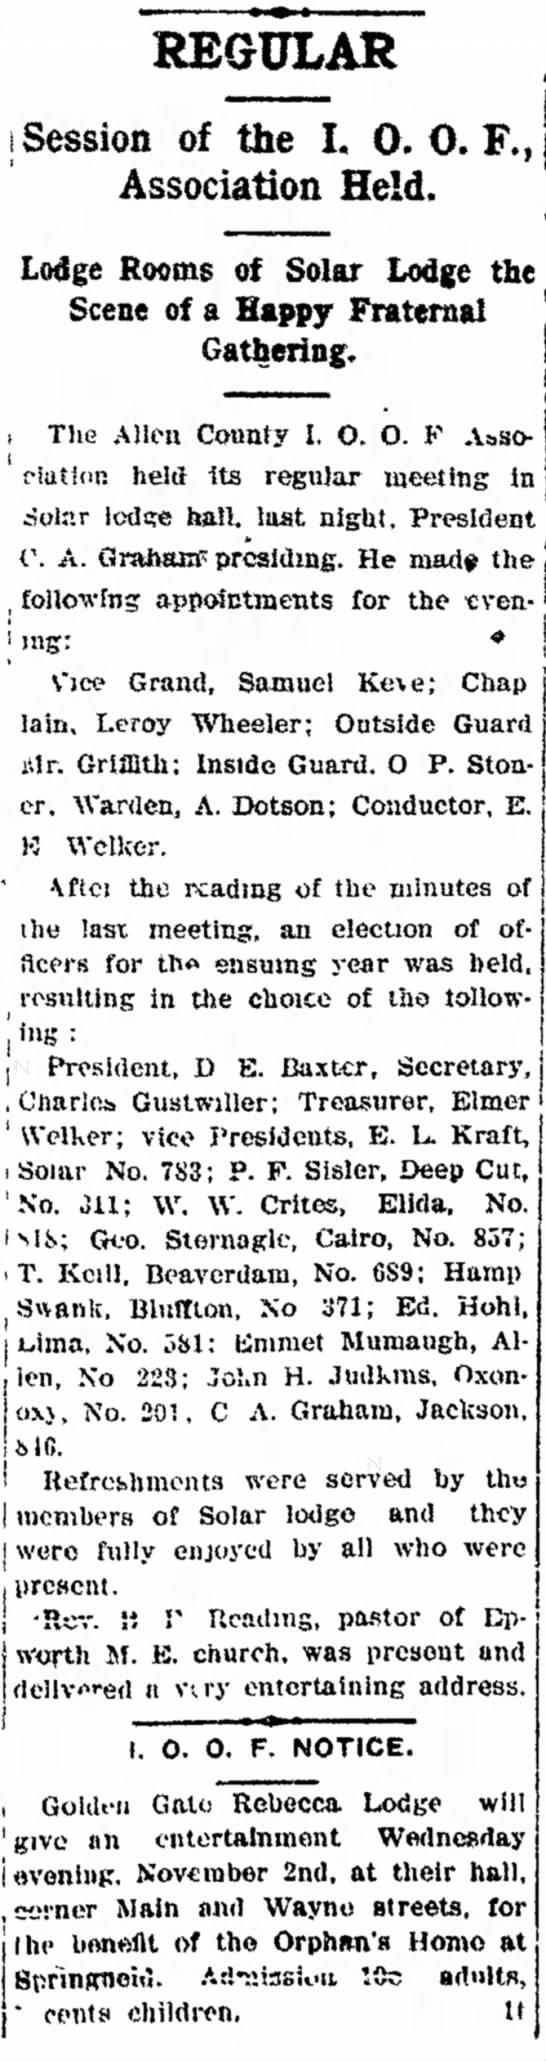 Charles Gustwiller elected Secretary of Allen County I. O. O. F. Association -